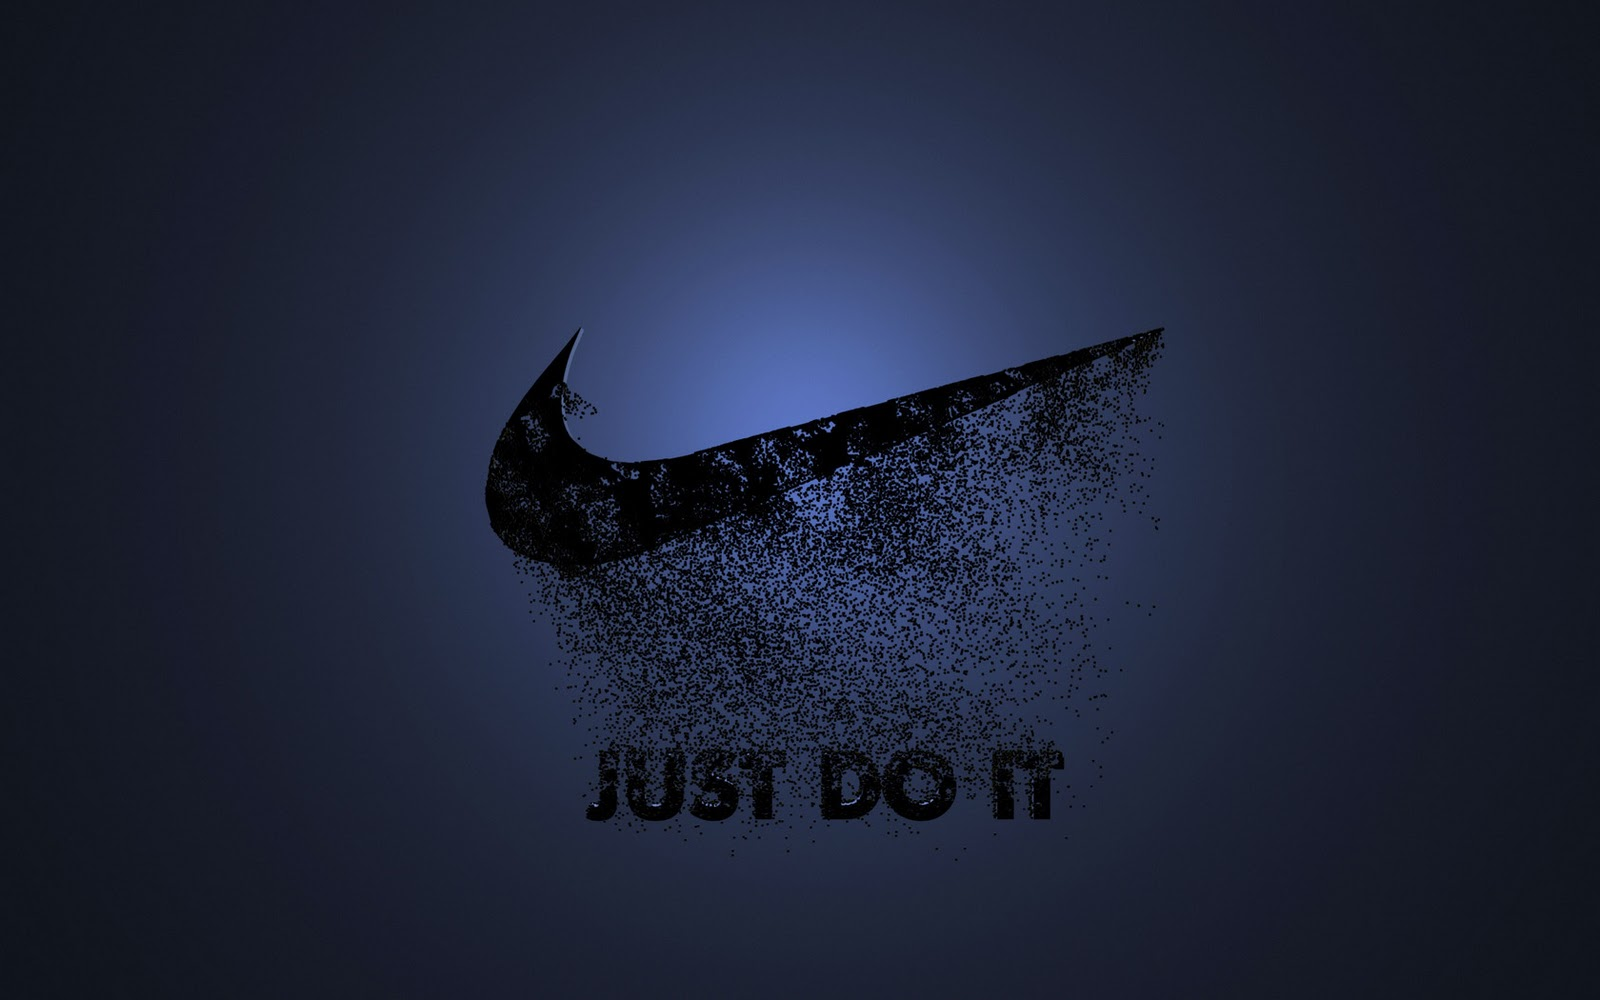 Just Do It Wallpaper HD on WallpaperSafari